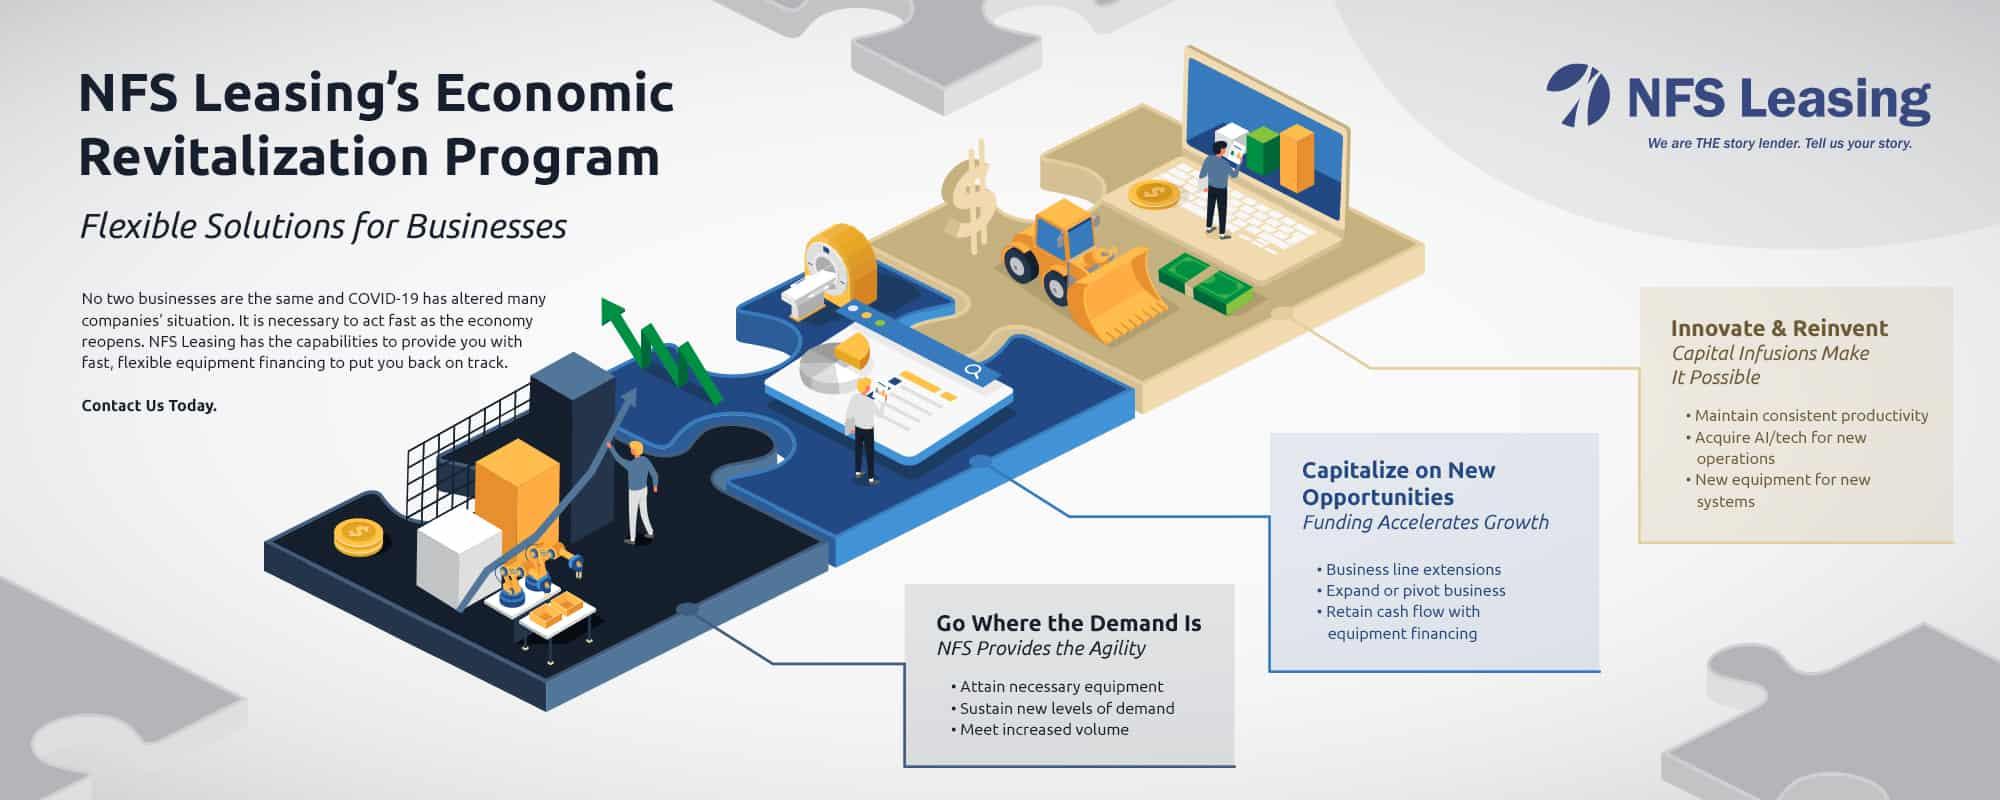 NFS Leasing's Economic Revitalization Program